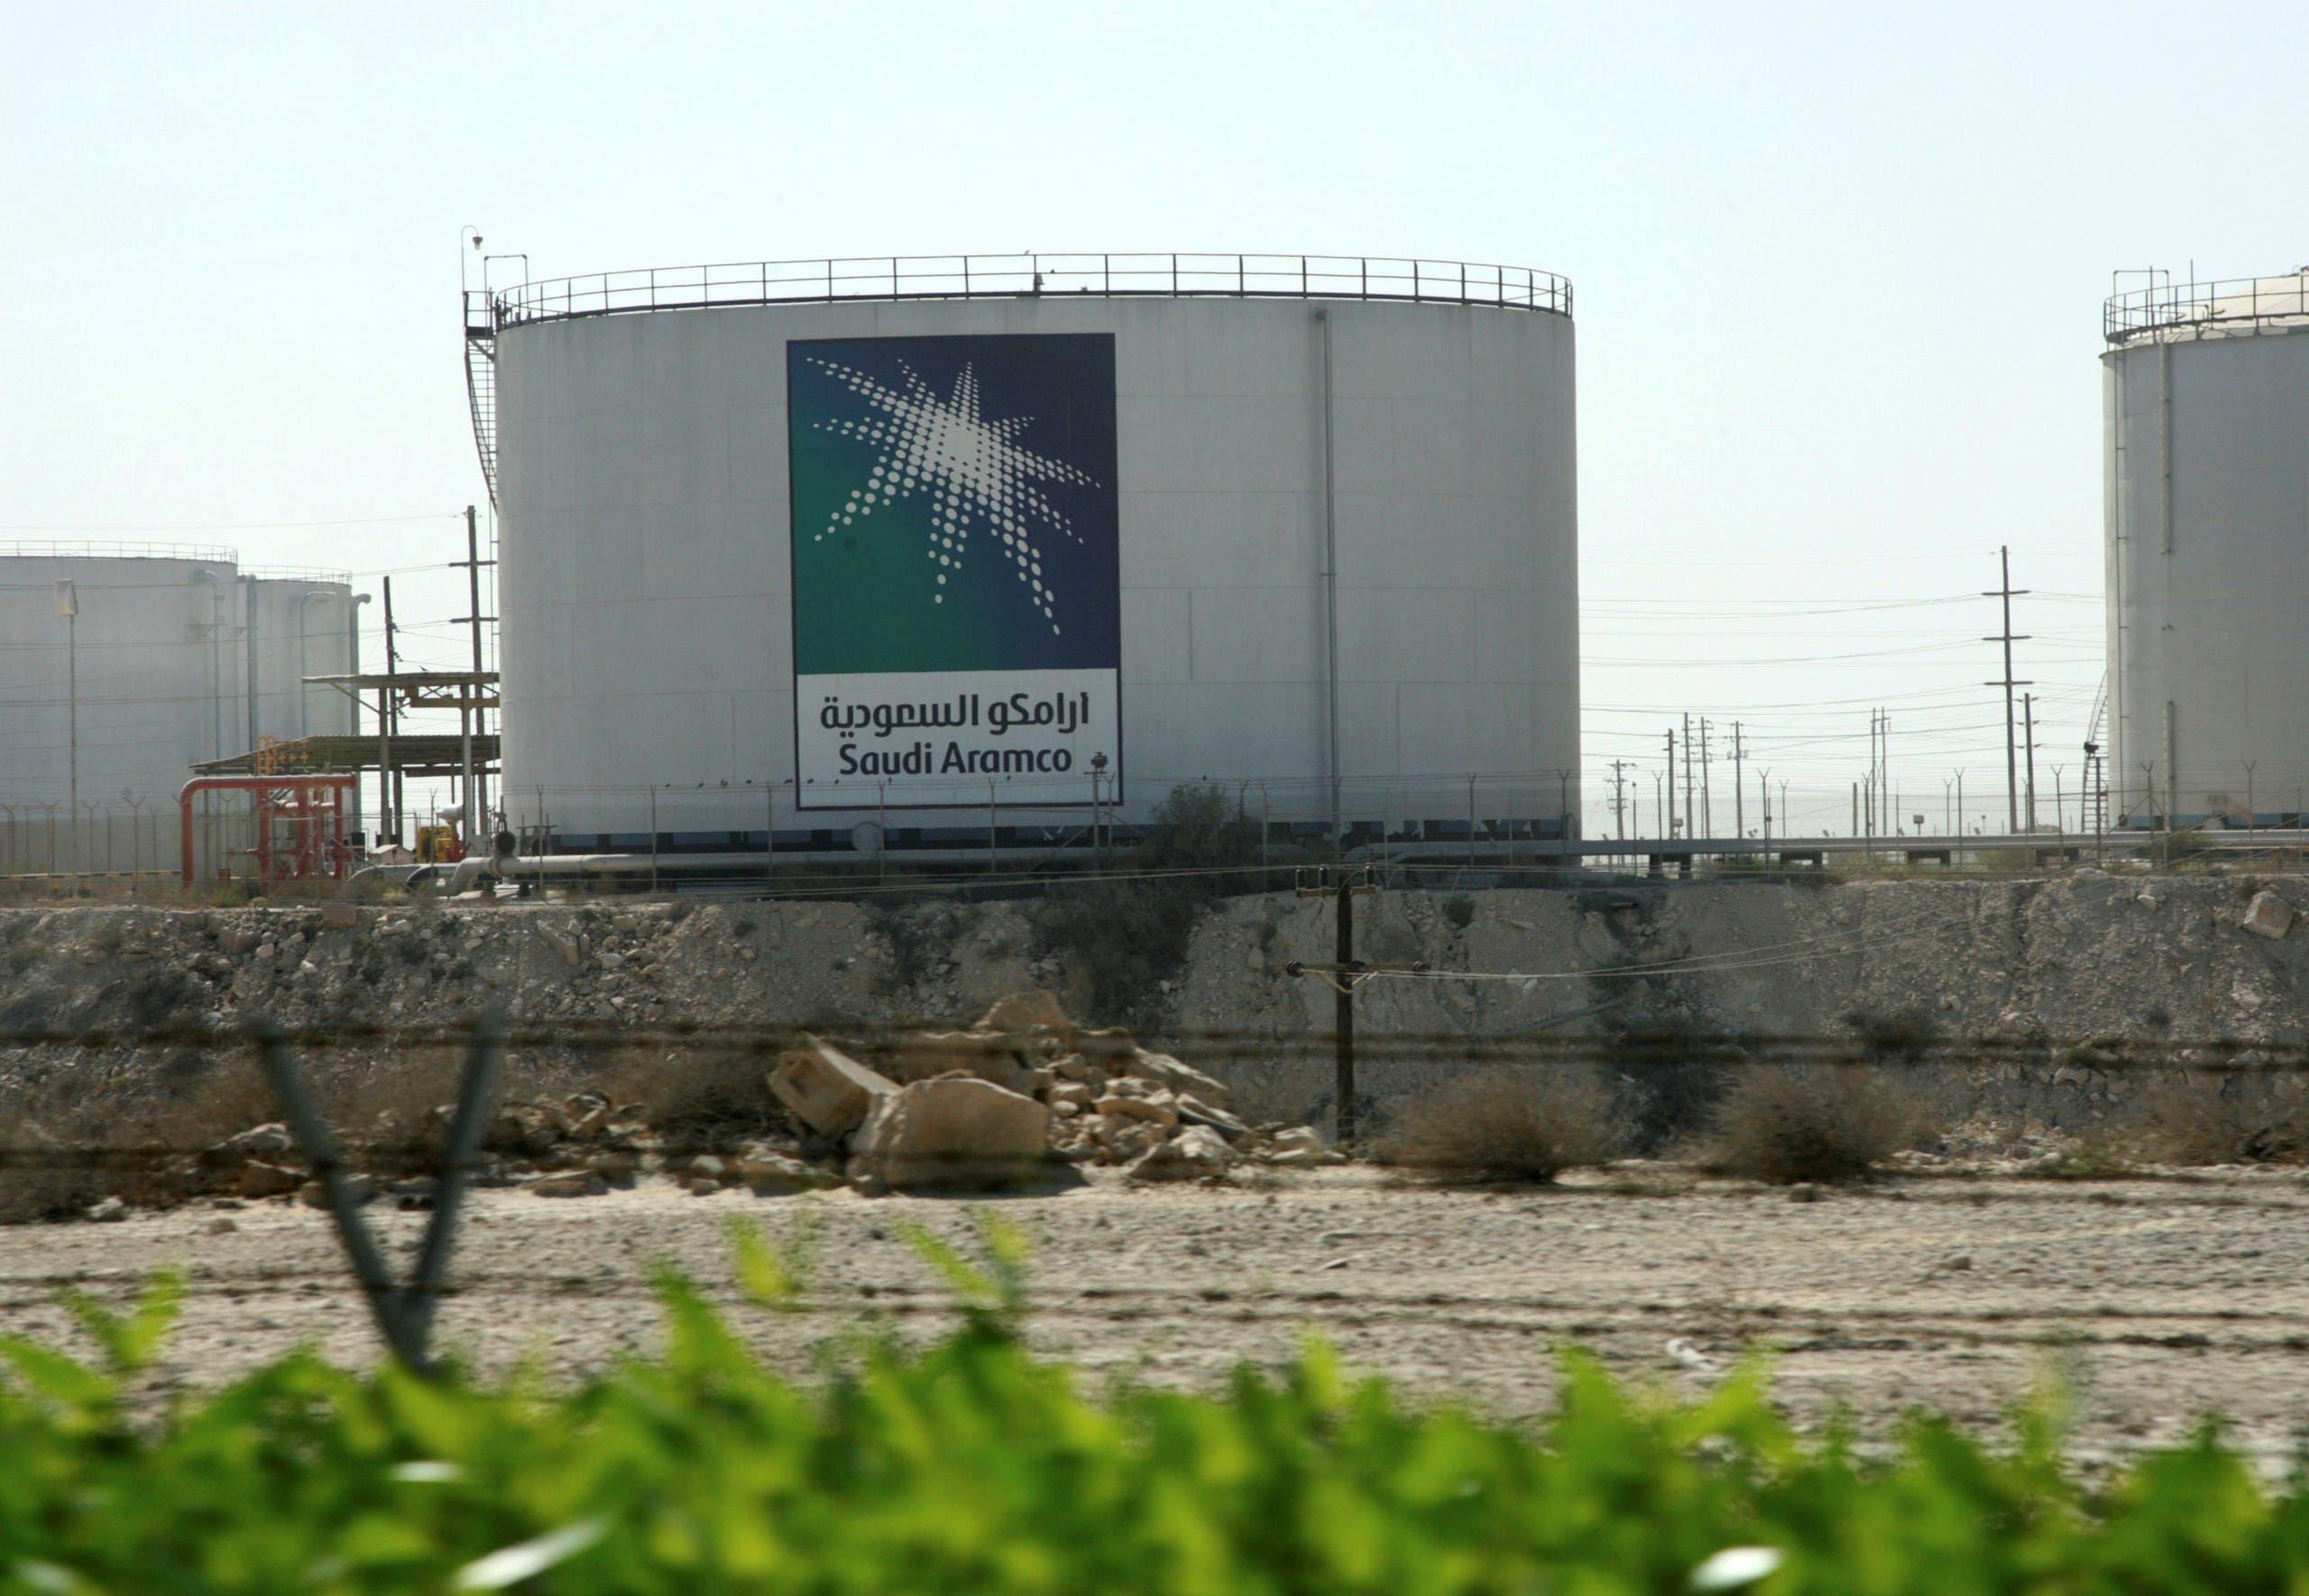 Oil tanks seen at the Saudi Aramco headquarters during a media tour at Damam city November 11, 2007. (Reuters)